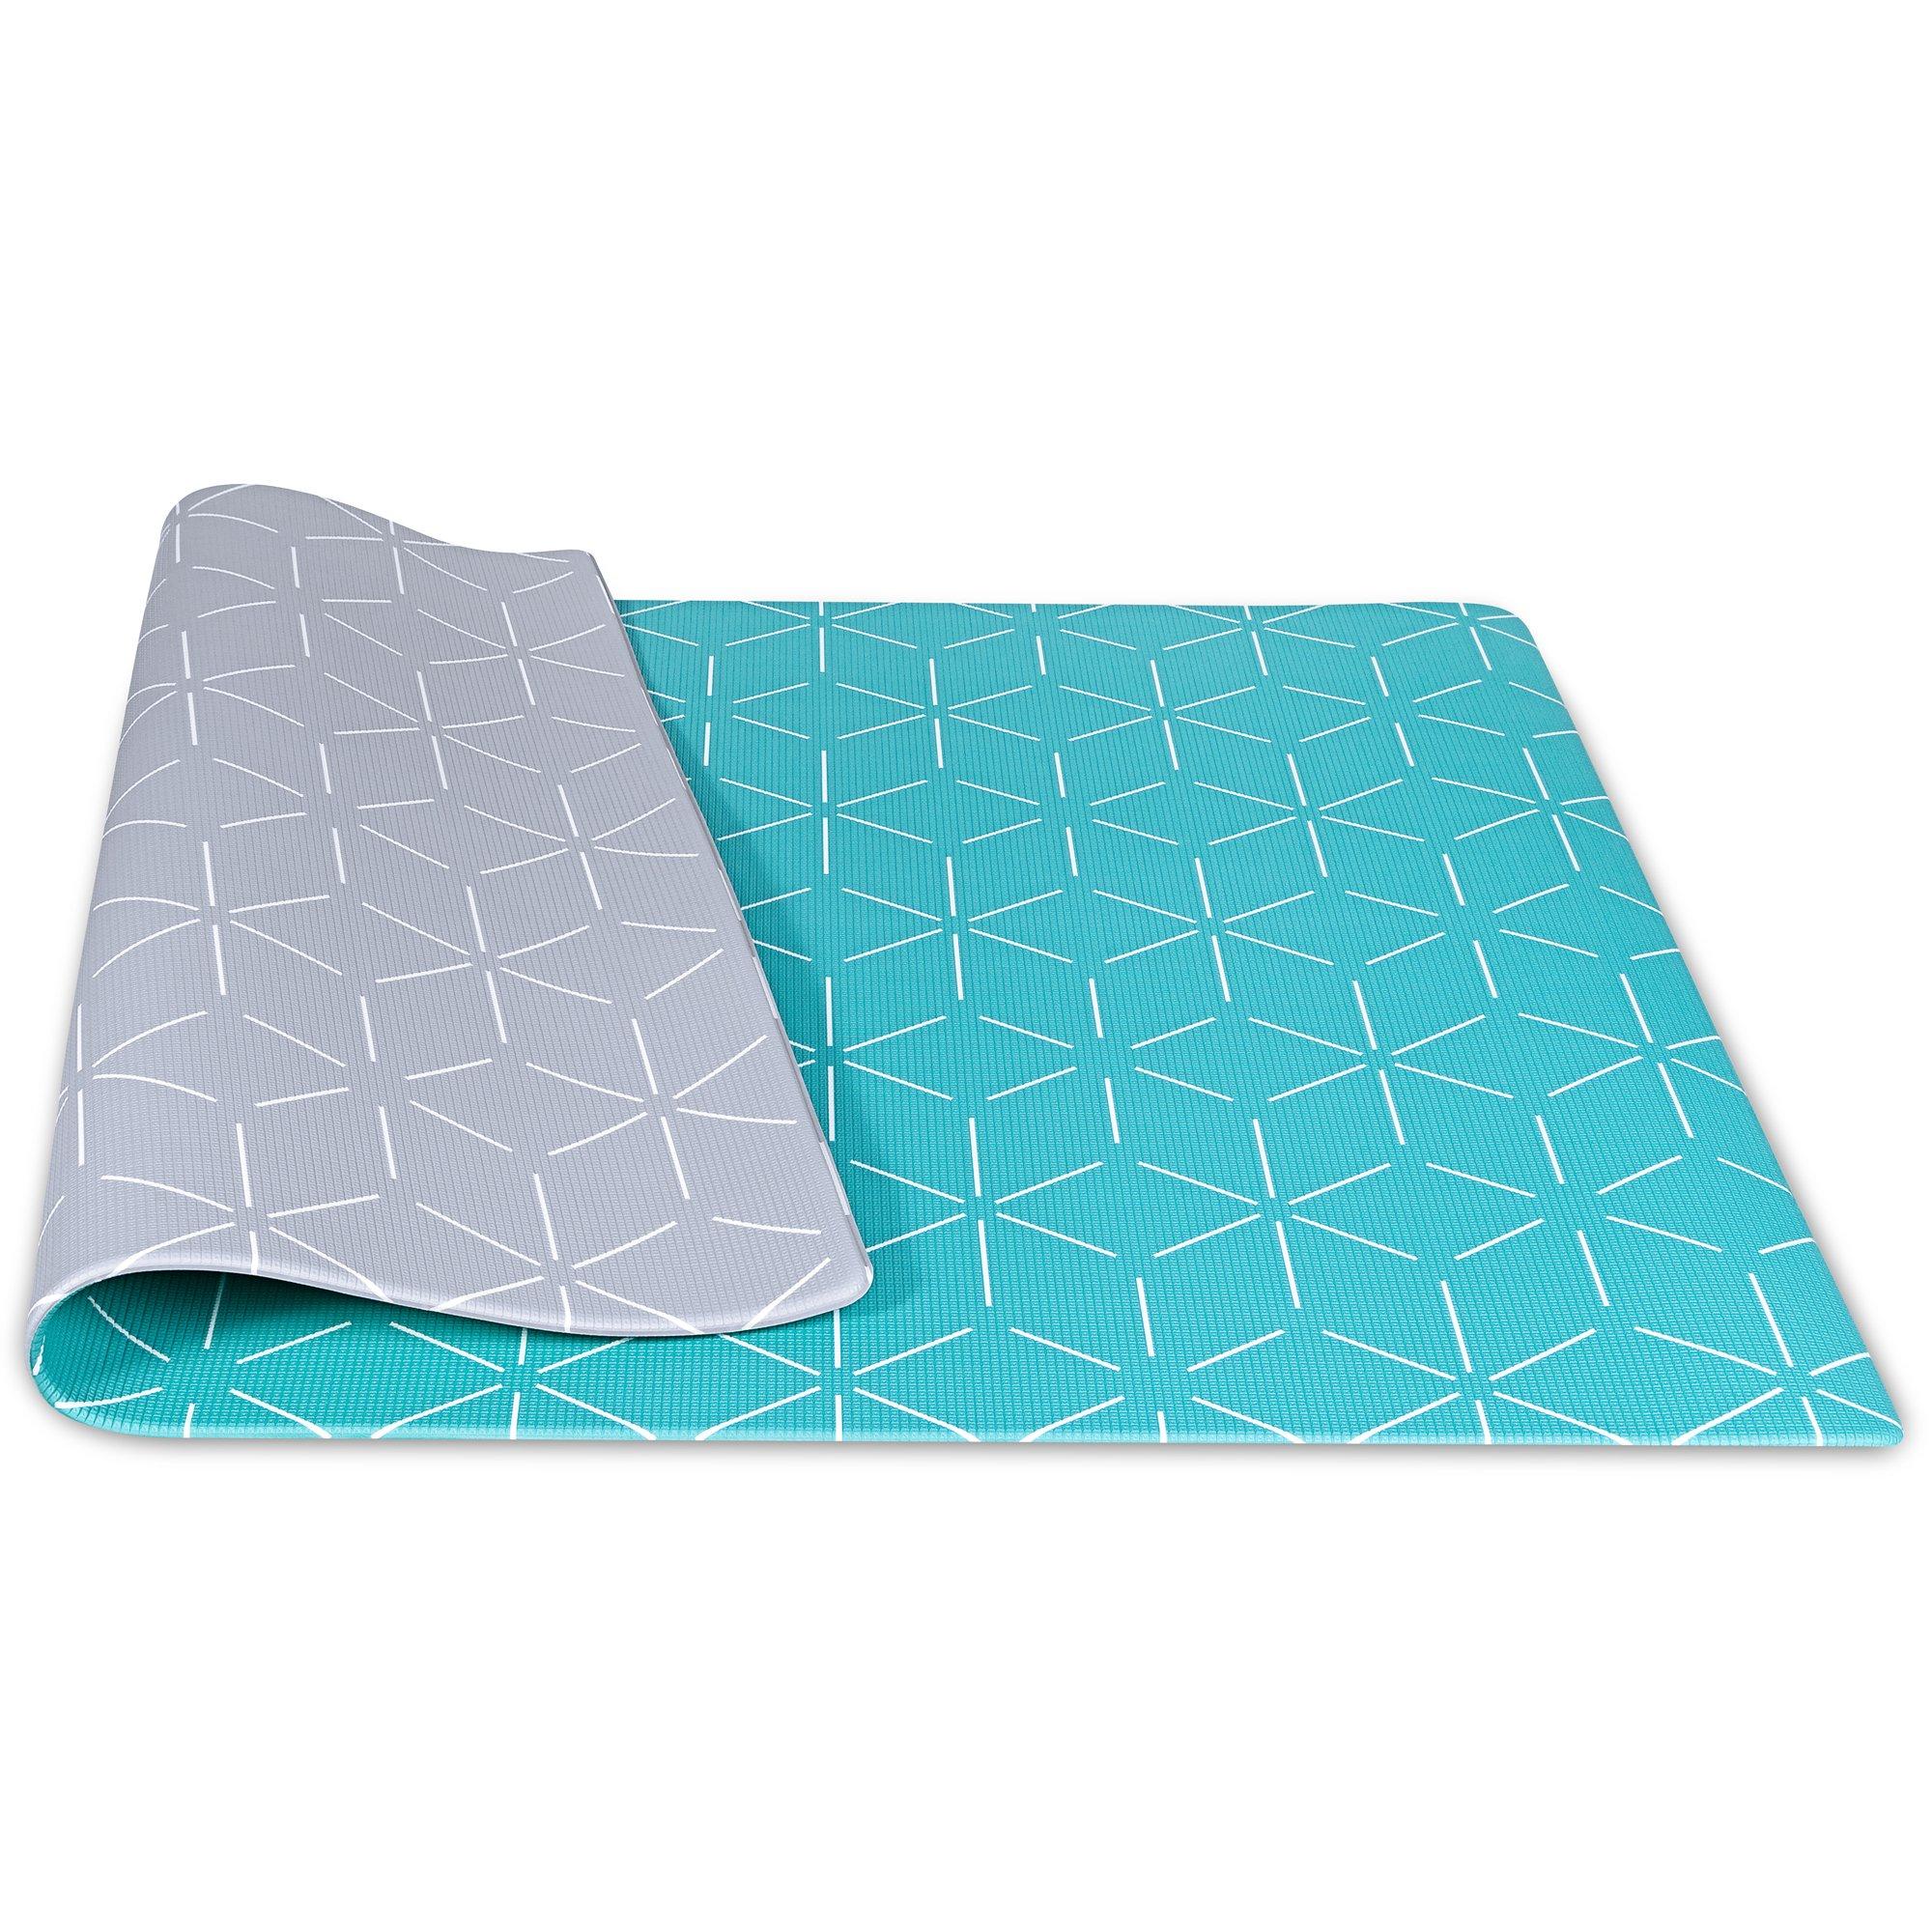 mat itm for mats soft babies sponge fruit play playmat children numeracy learning child pnc floor literacy